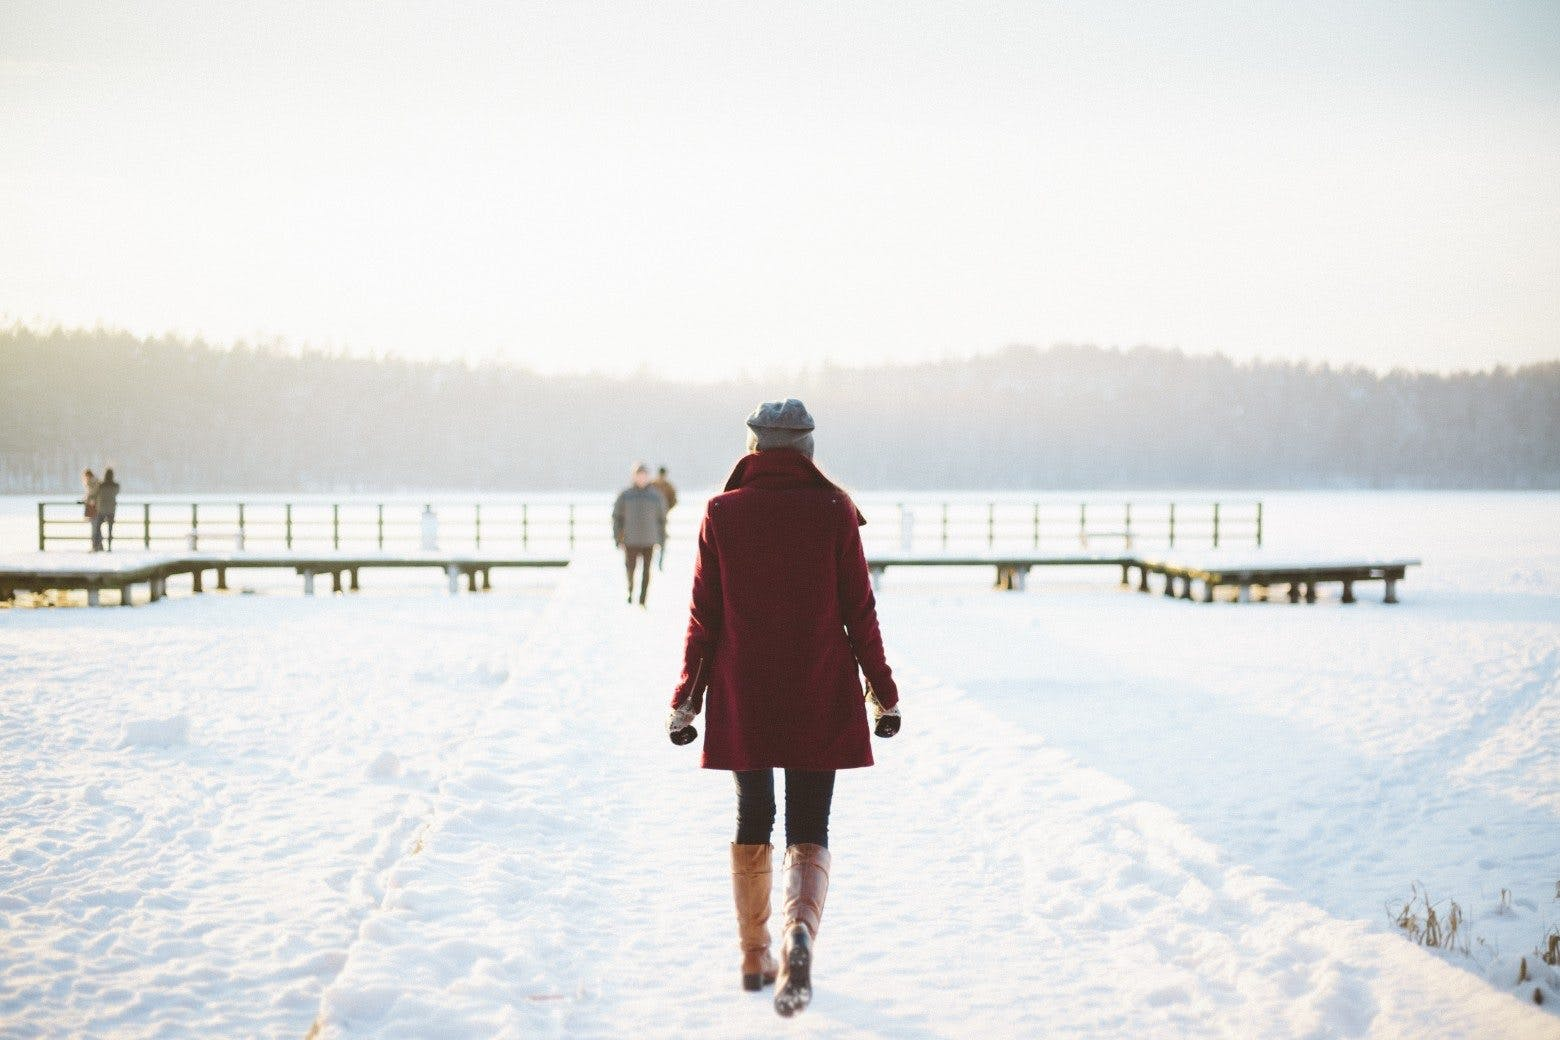 vinter-kvinna-sno-is-promenad-livsstil-1560x1040